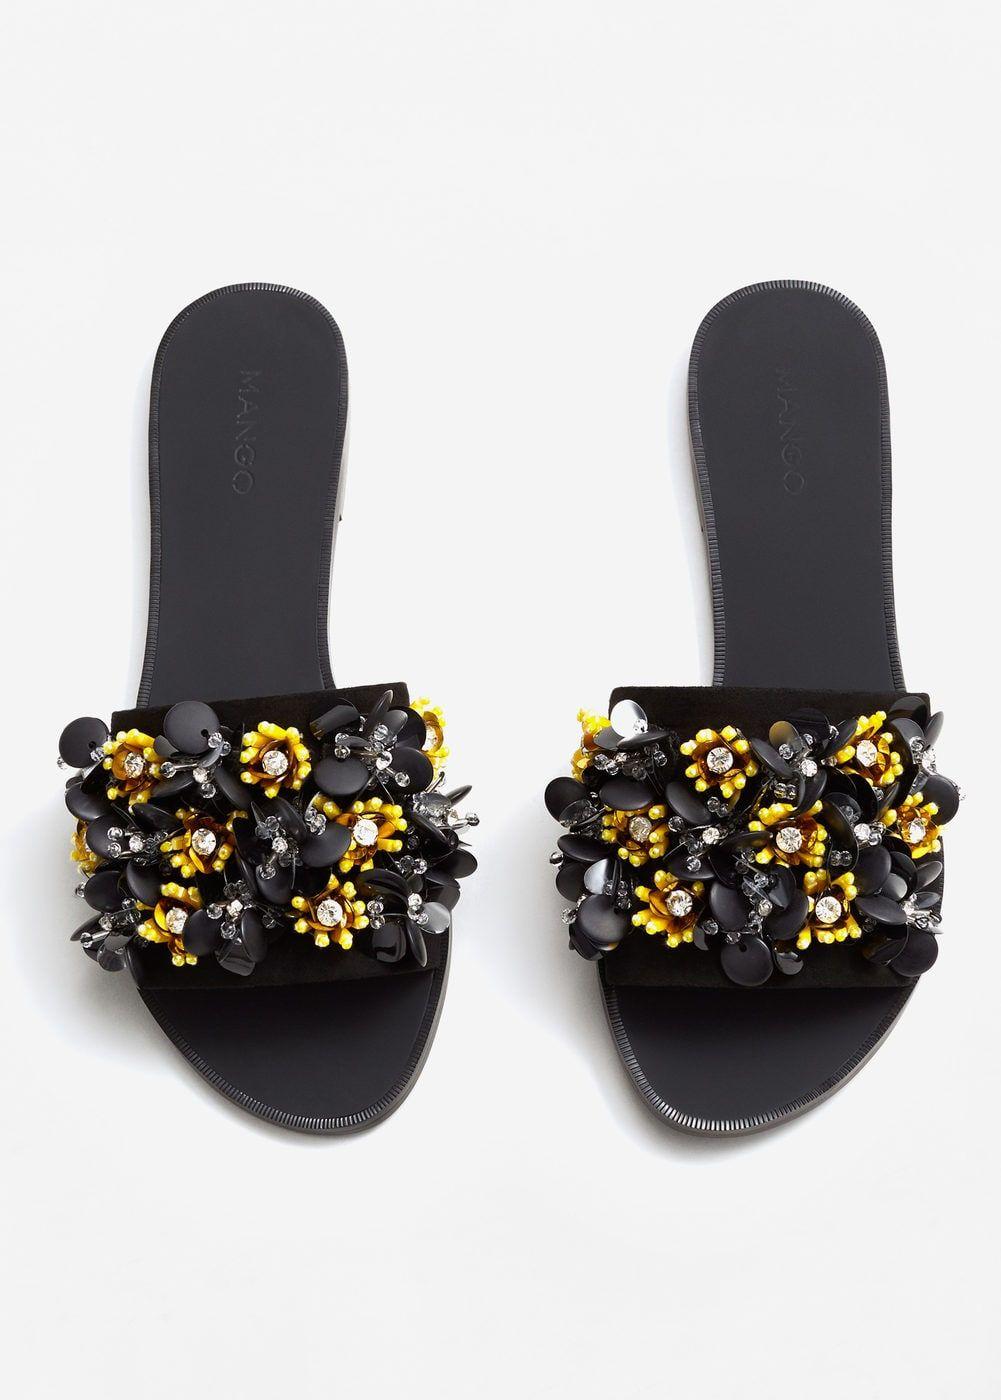 Womens Pearl Faux Fur Slides Mules Sliders Beach Summer Sandals Trendy Designer